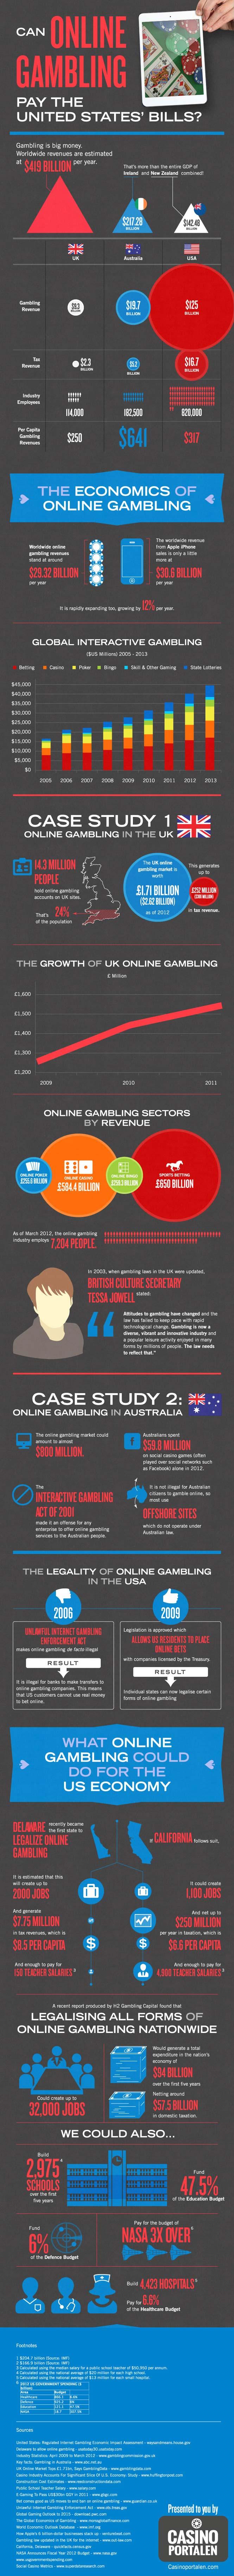 Online Gambling Economics-Infographic